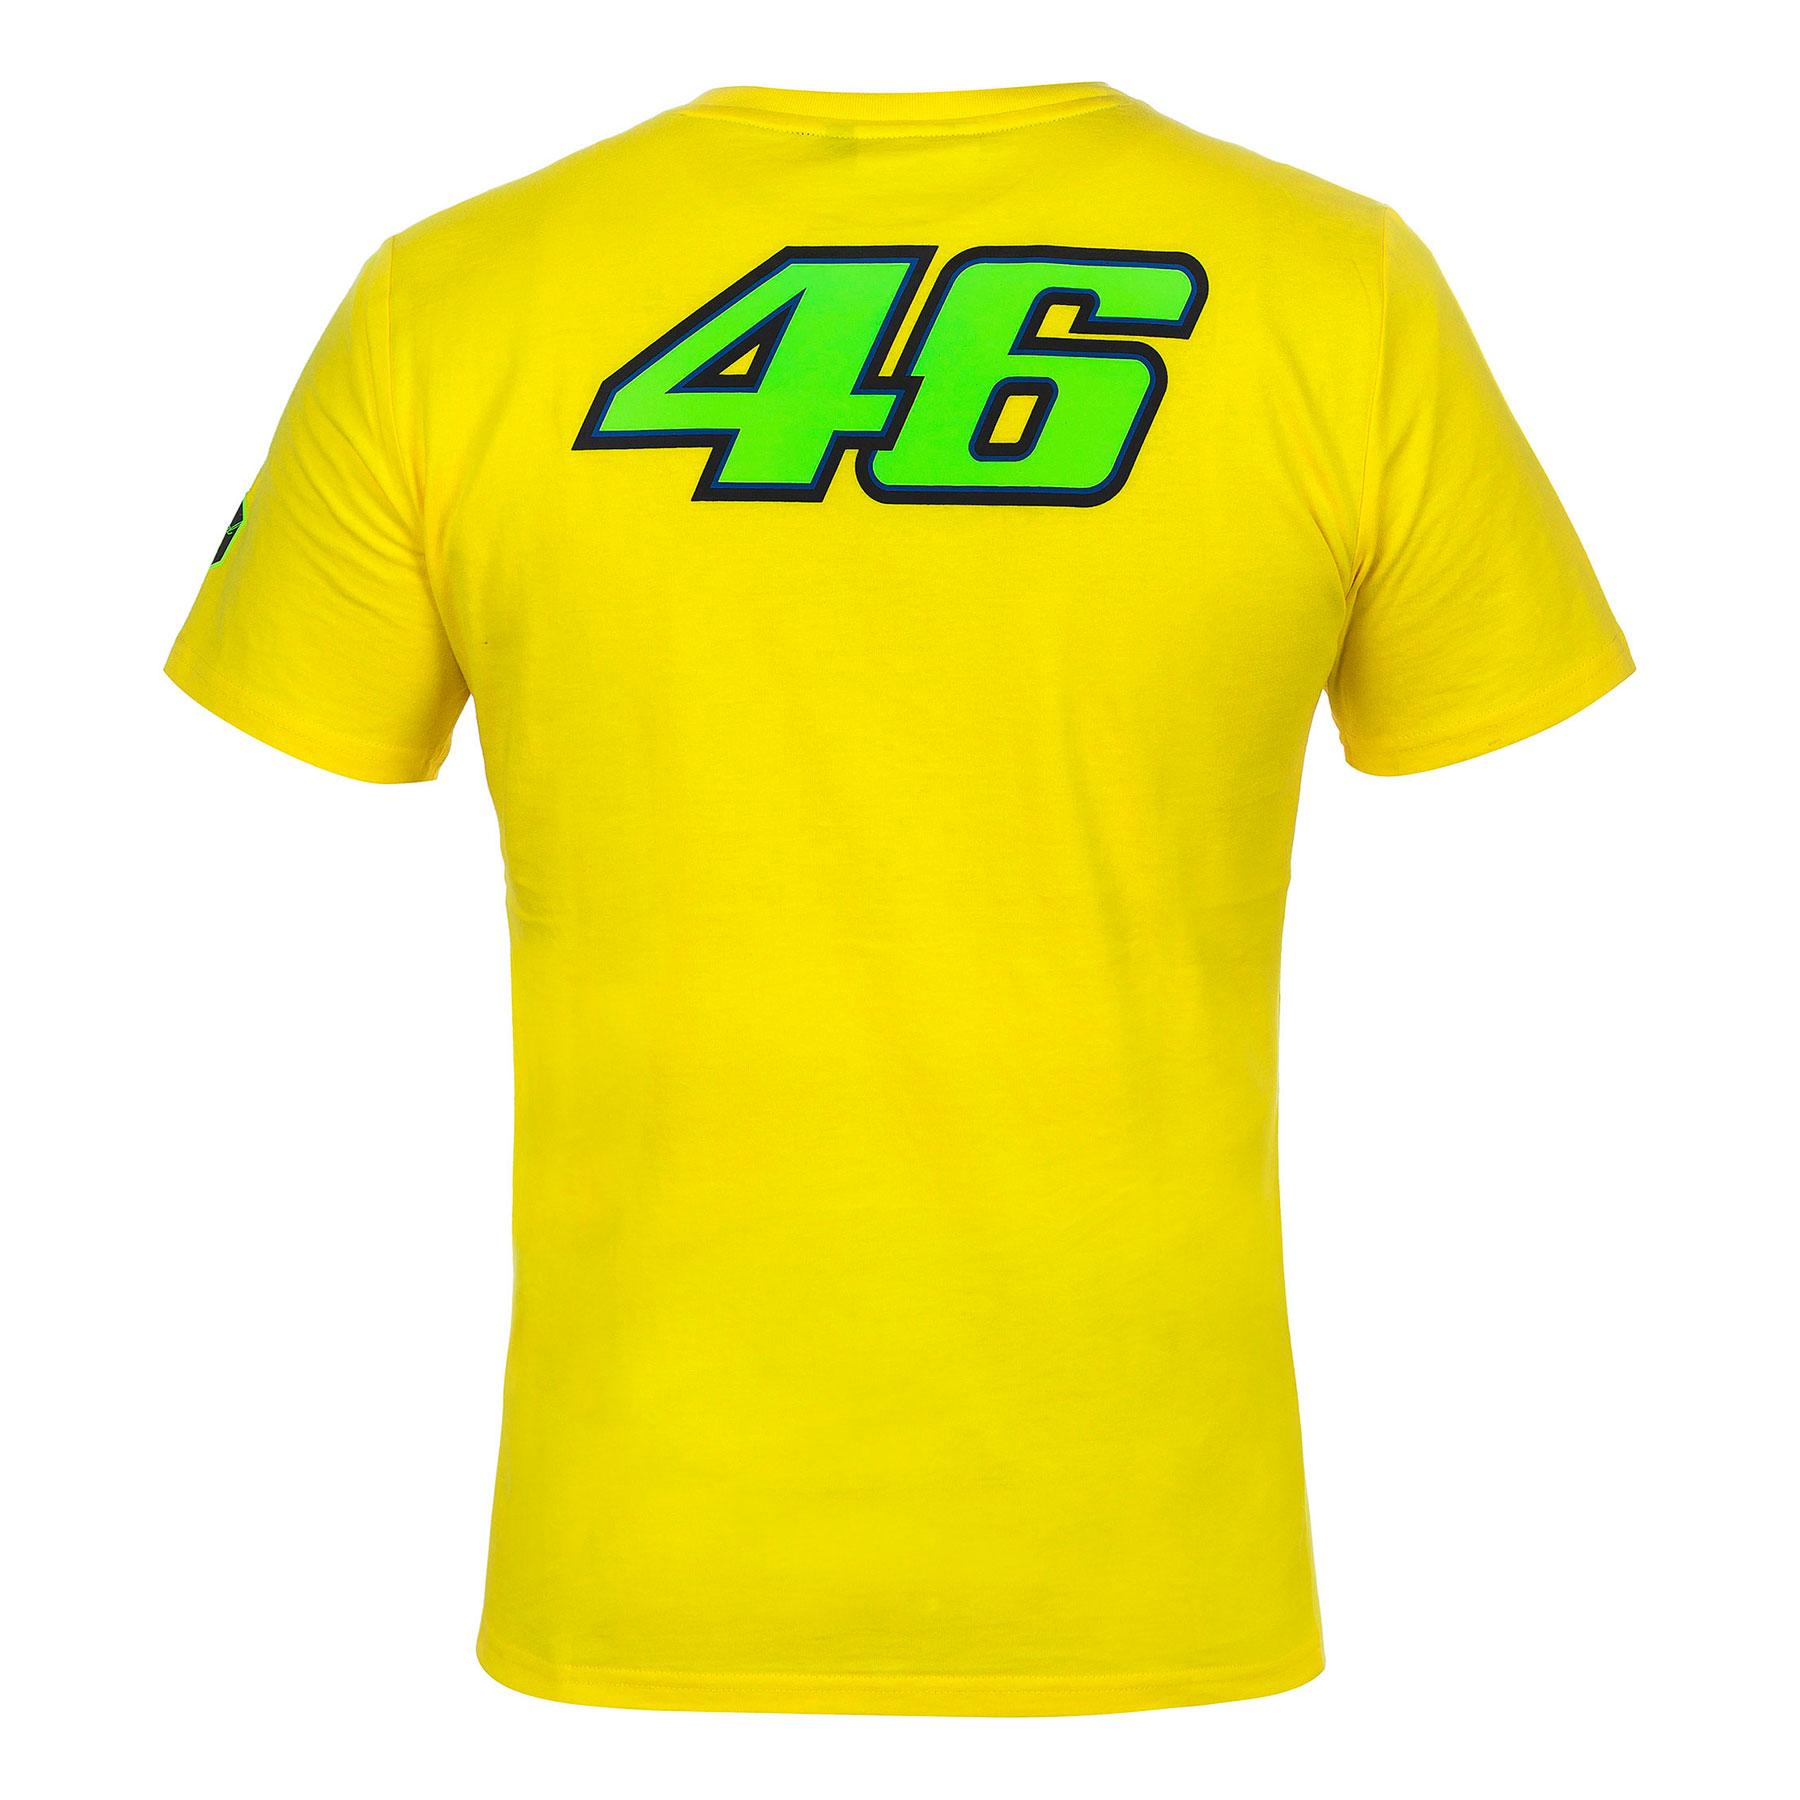 7a06e84c3d Camiseta Valentino Rossi The Doctor Amarilla 2017 en Motorbike Store